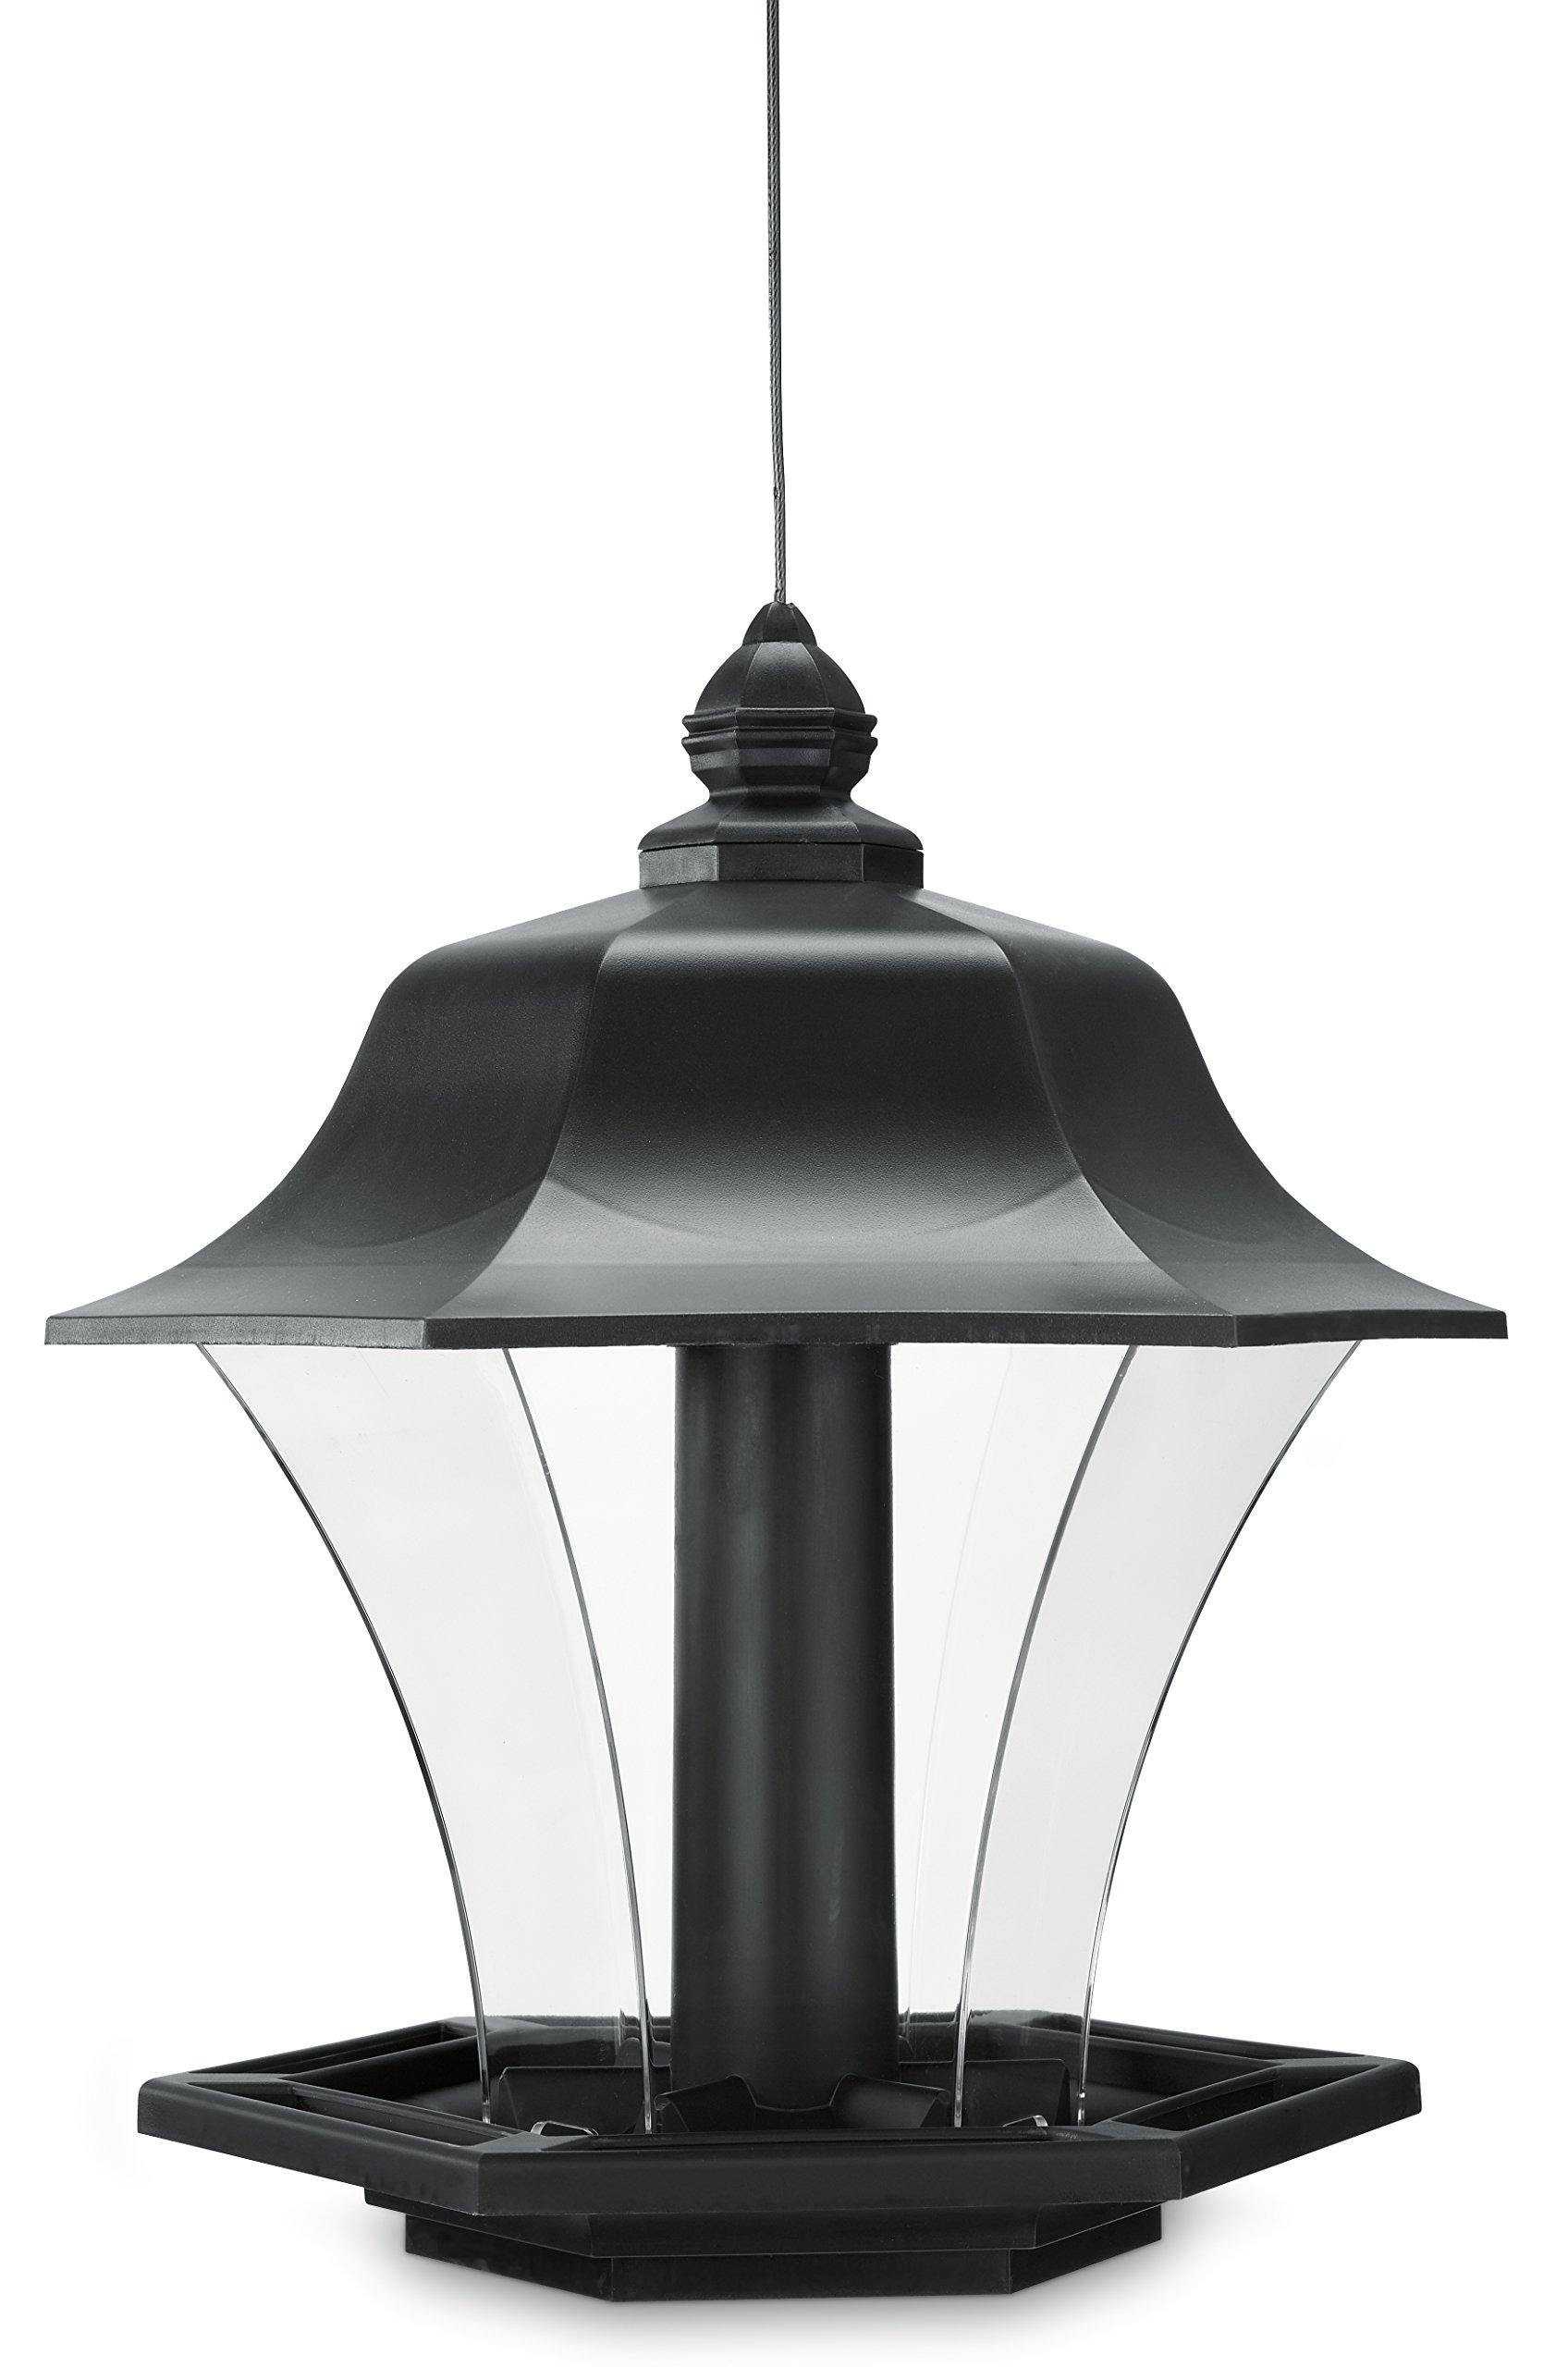 Pennington Garden Coach Light Lantern Style Bird Feeder Made in the USA, Plastic